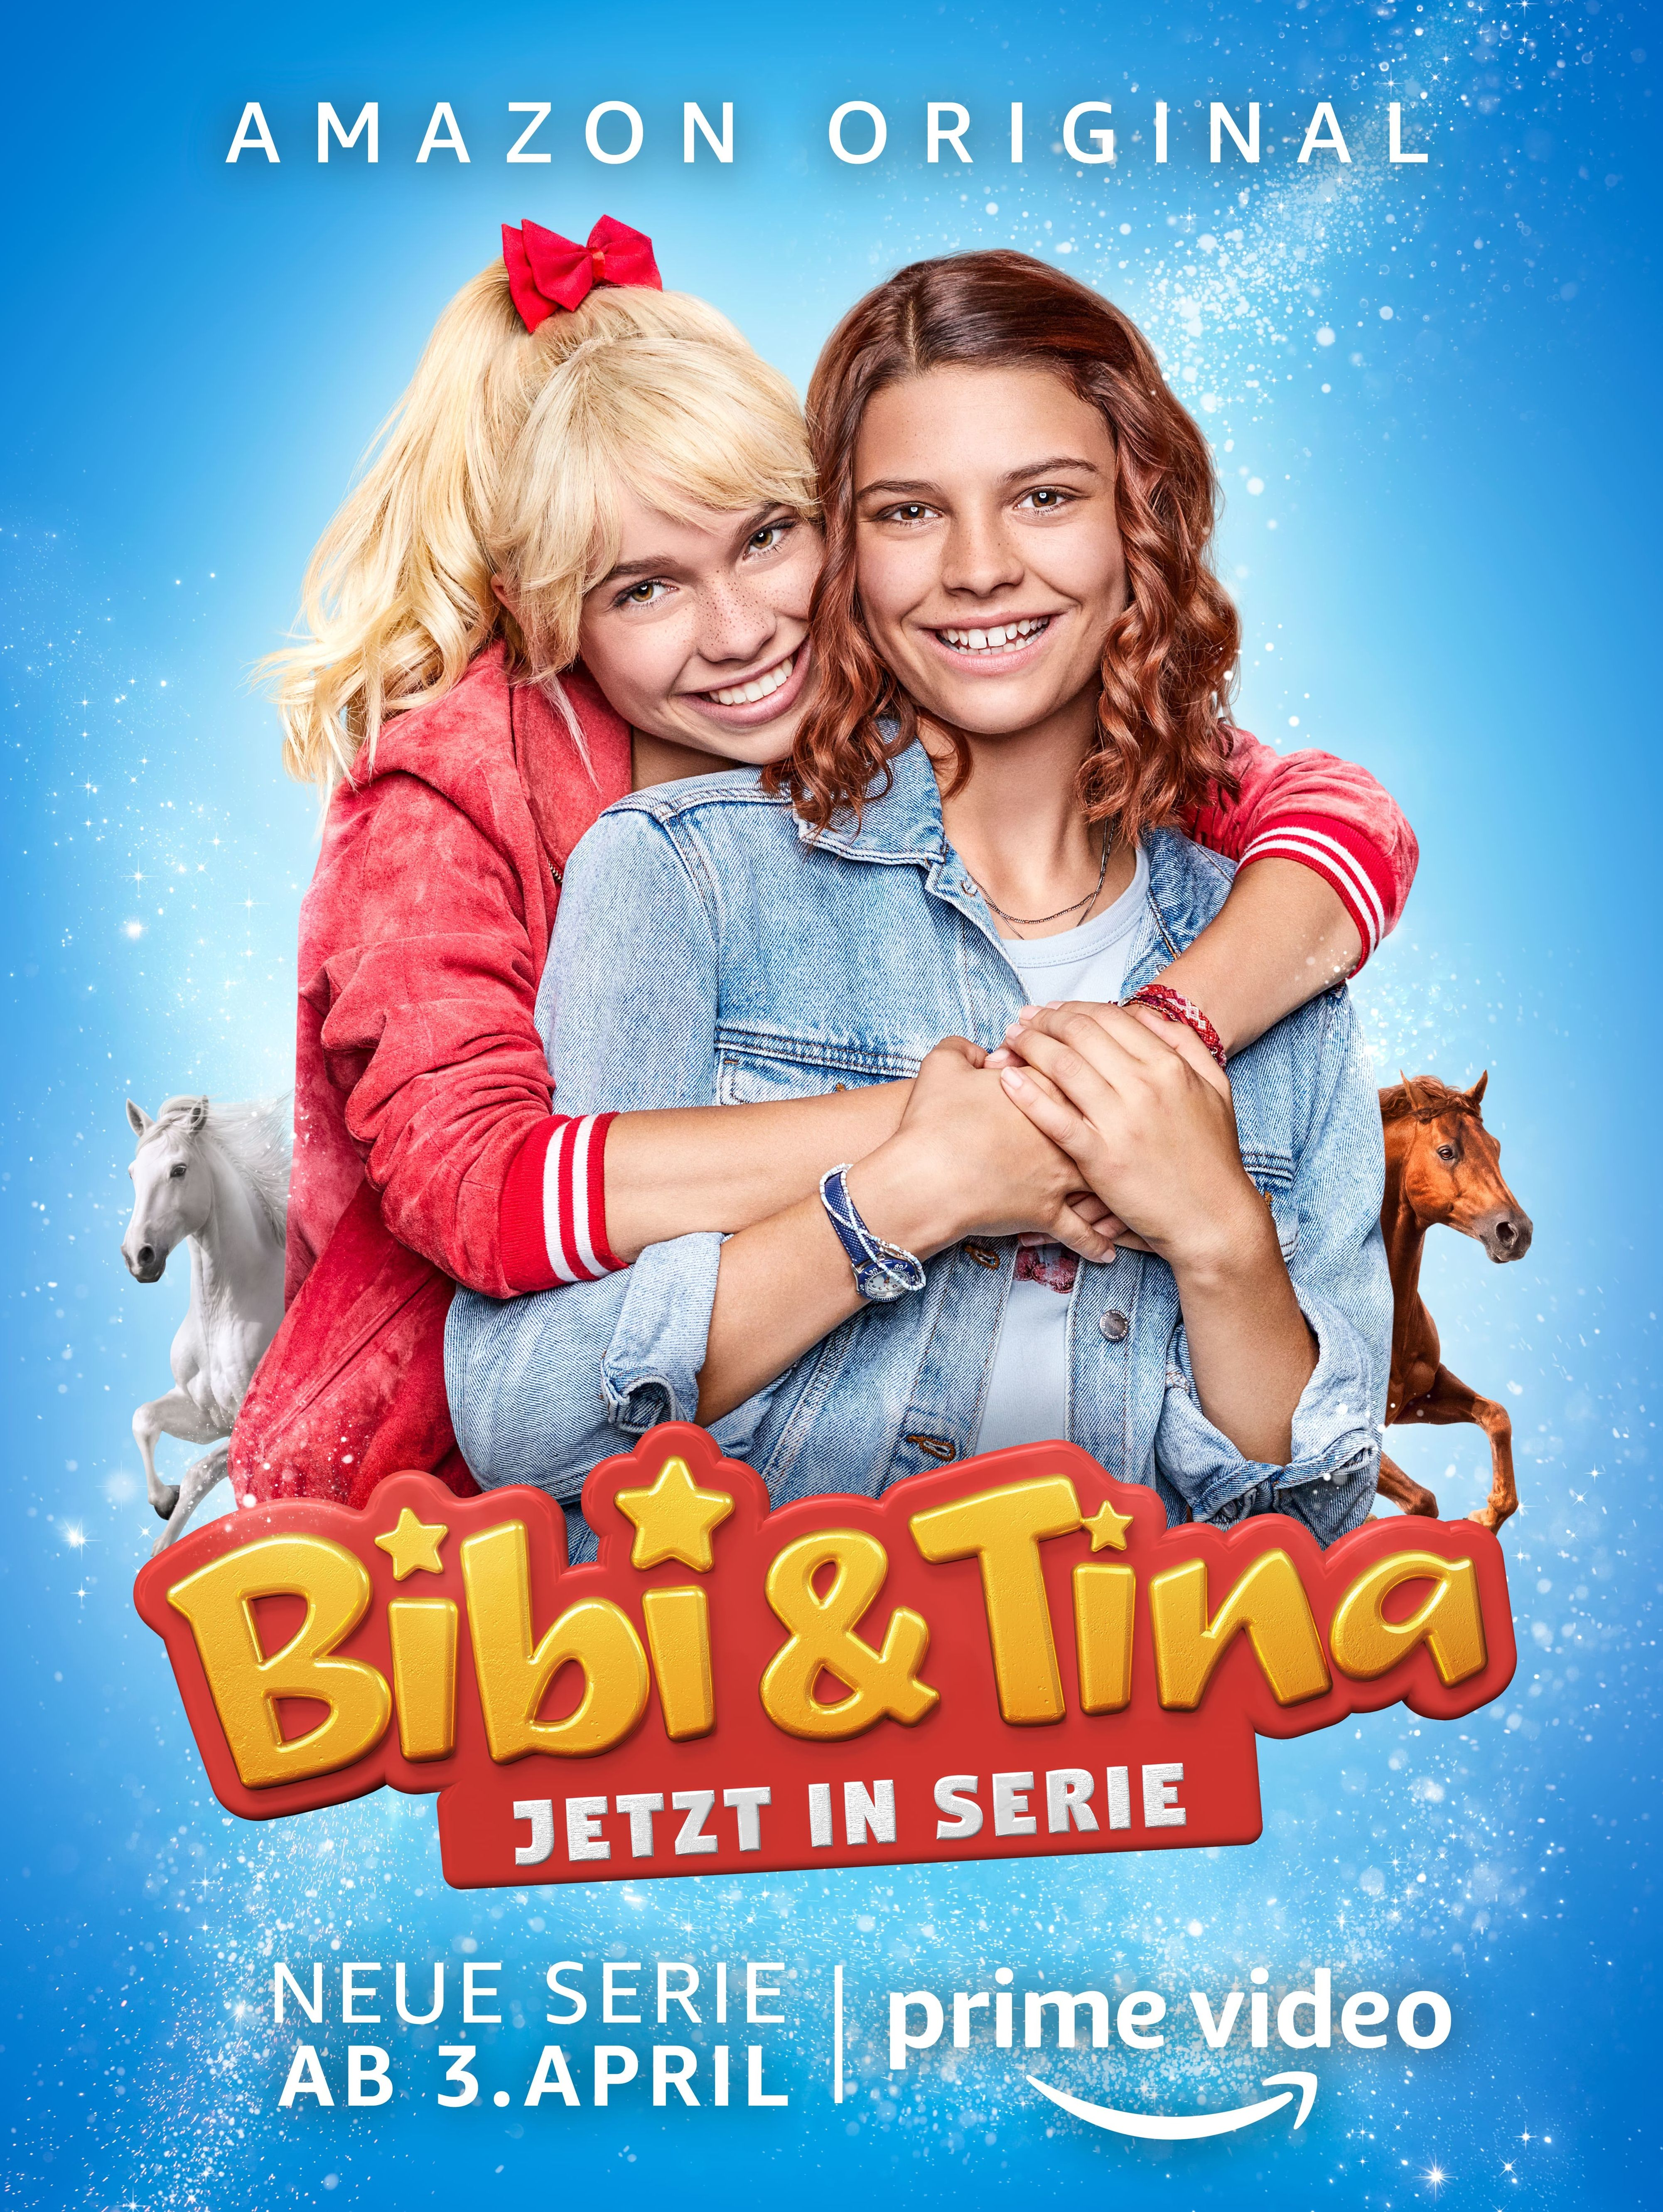 bibi und tina serie staffel 2